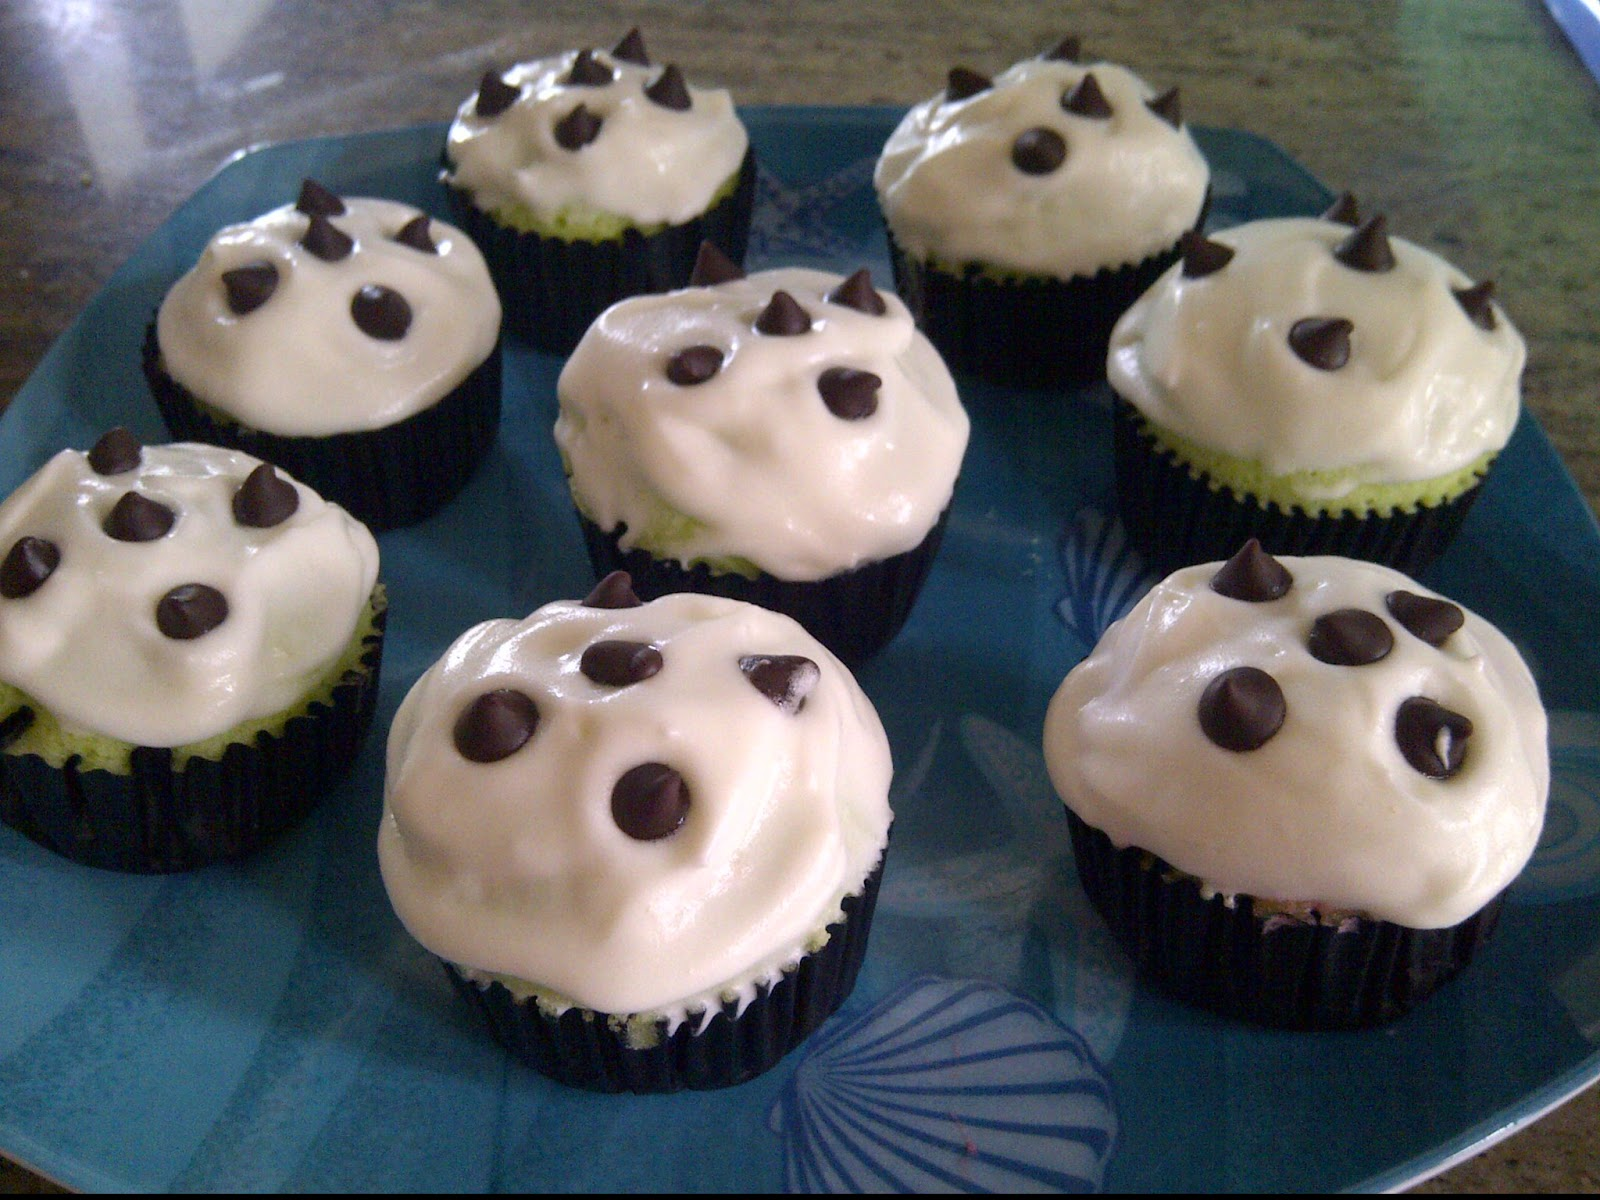 My life resep cup cake kukus pandan click for details resep cup cake